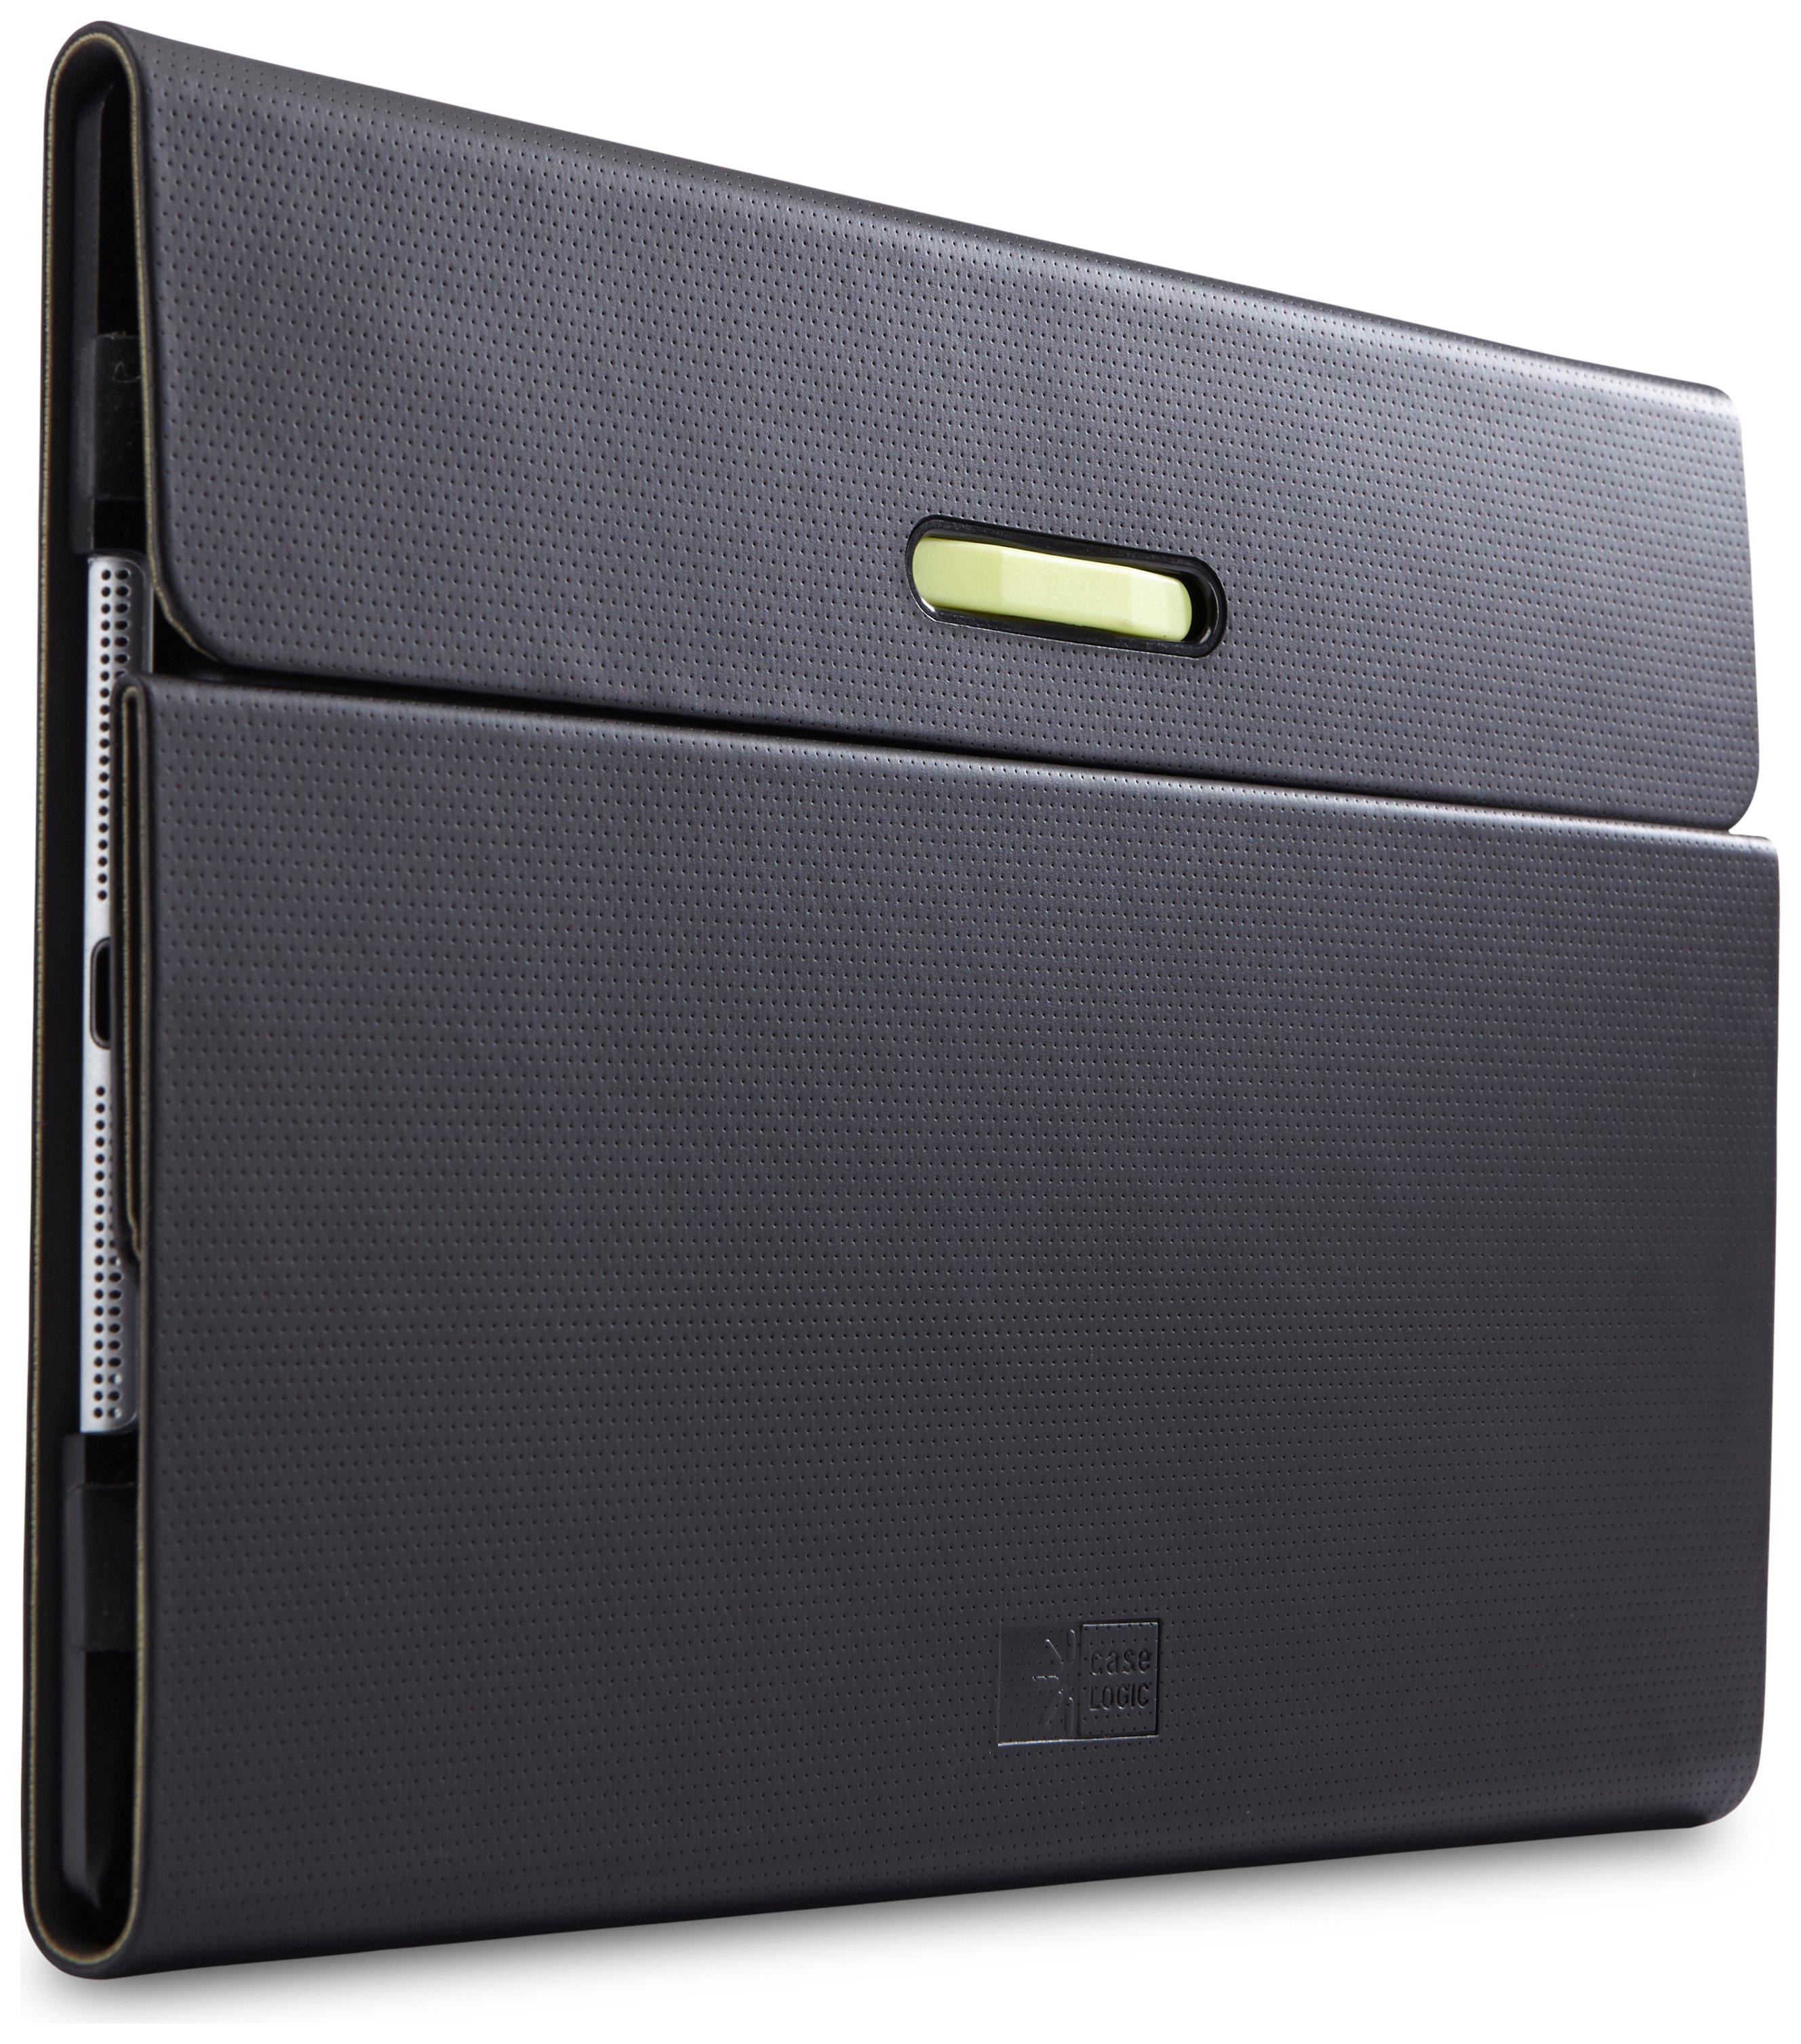 Case Logic Rotating Slim Folio for iPad Air 2 - Black.